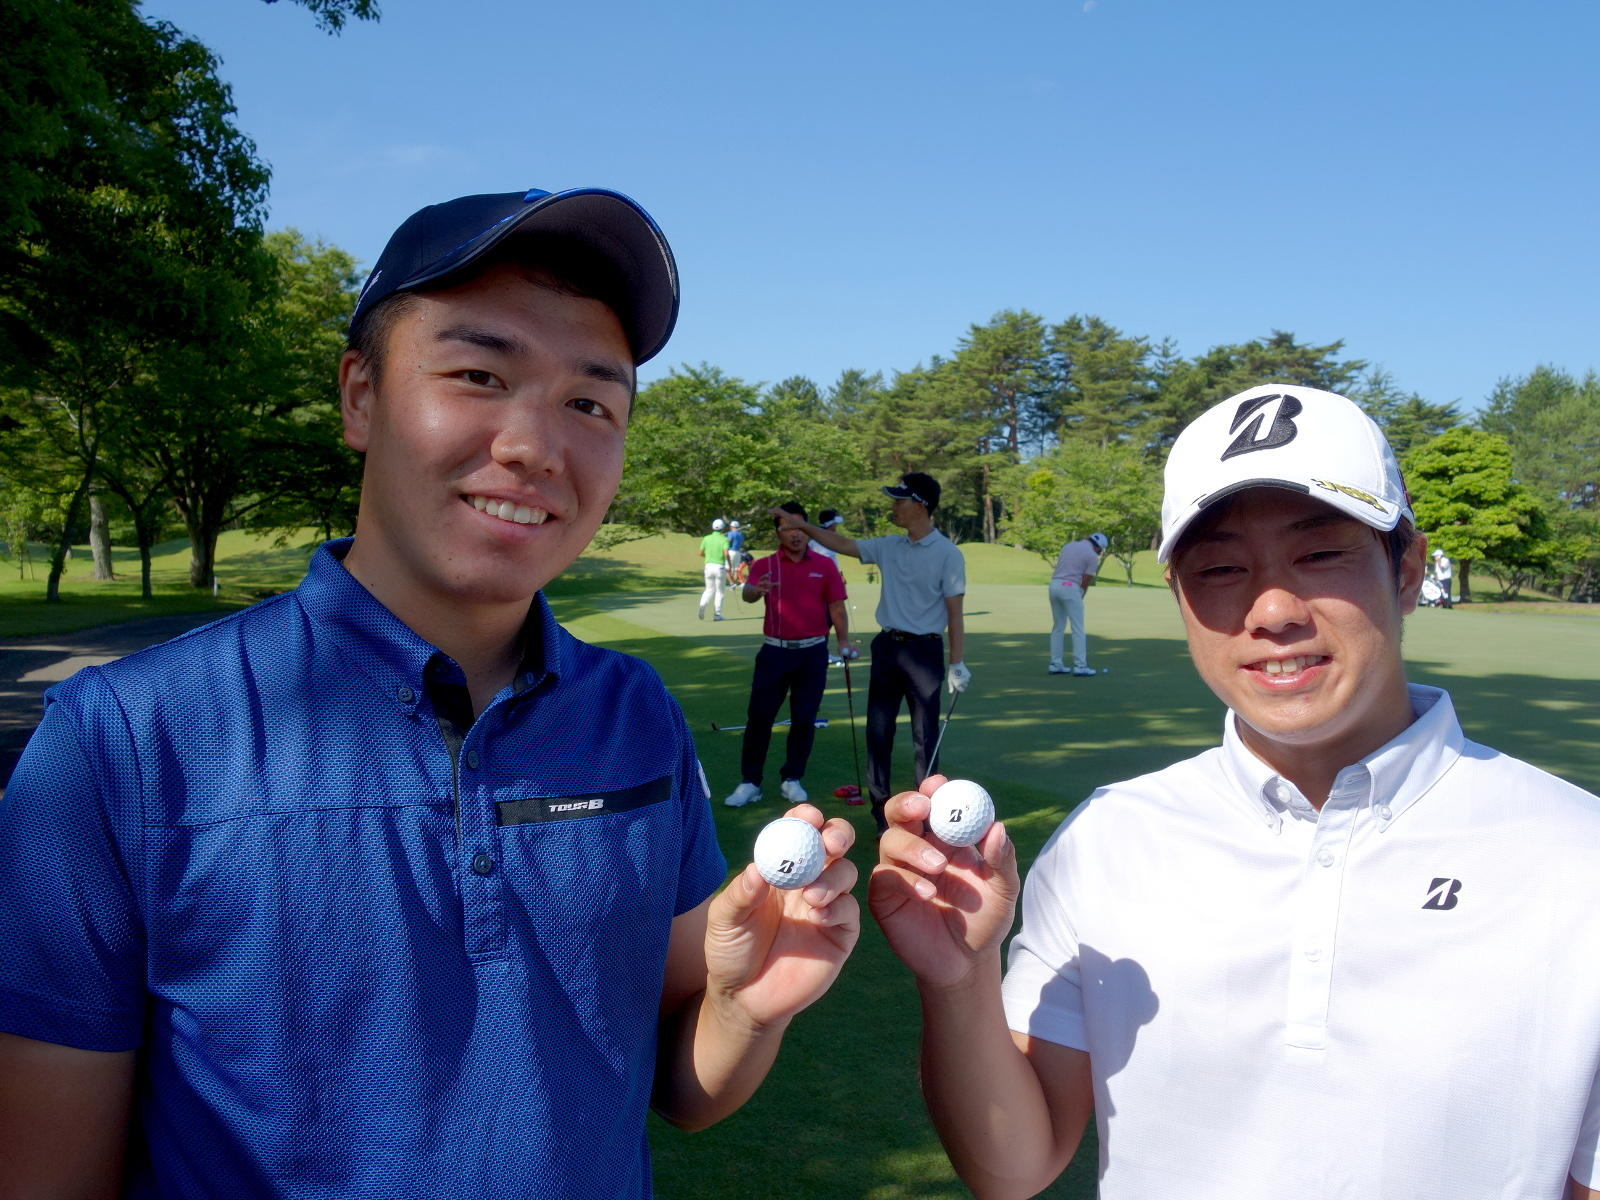 http://www.bs-golf.com/pro/556d1a920fc994b7679780371ca2250ea01b199b.JPG